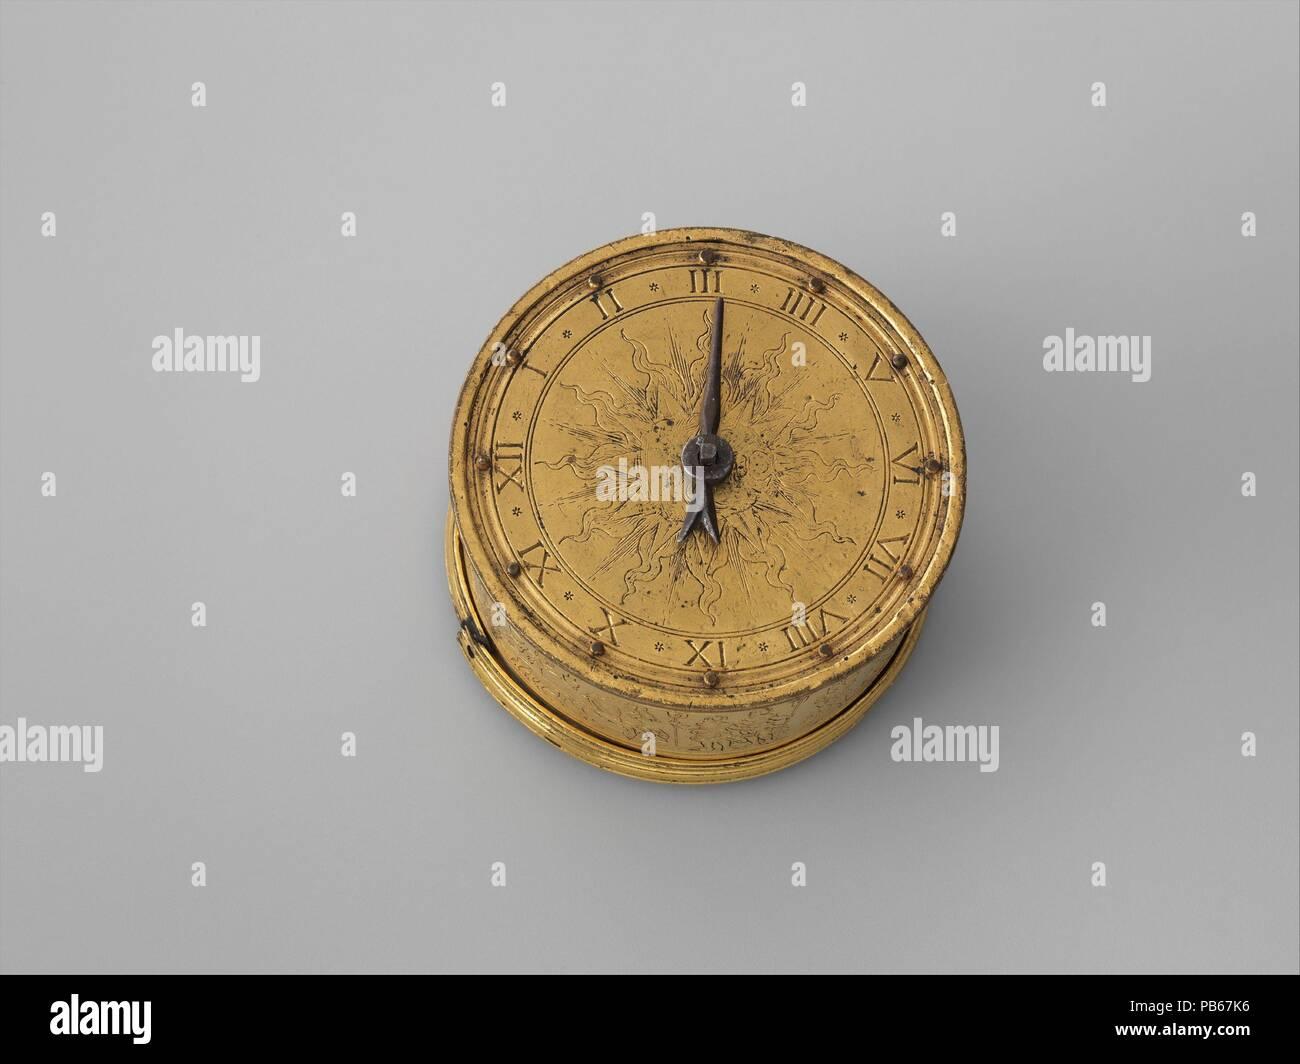 Table clock  Culture: German, possibly Nuremberg  Dimensions